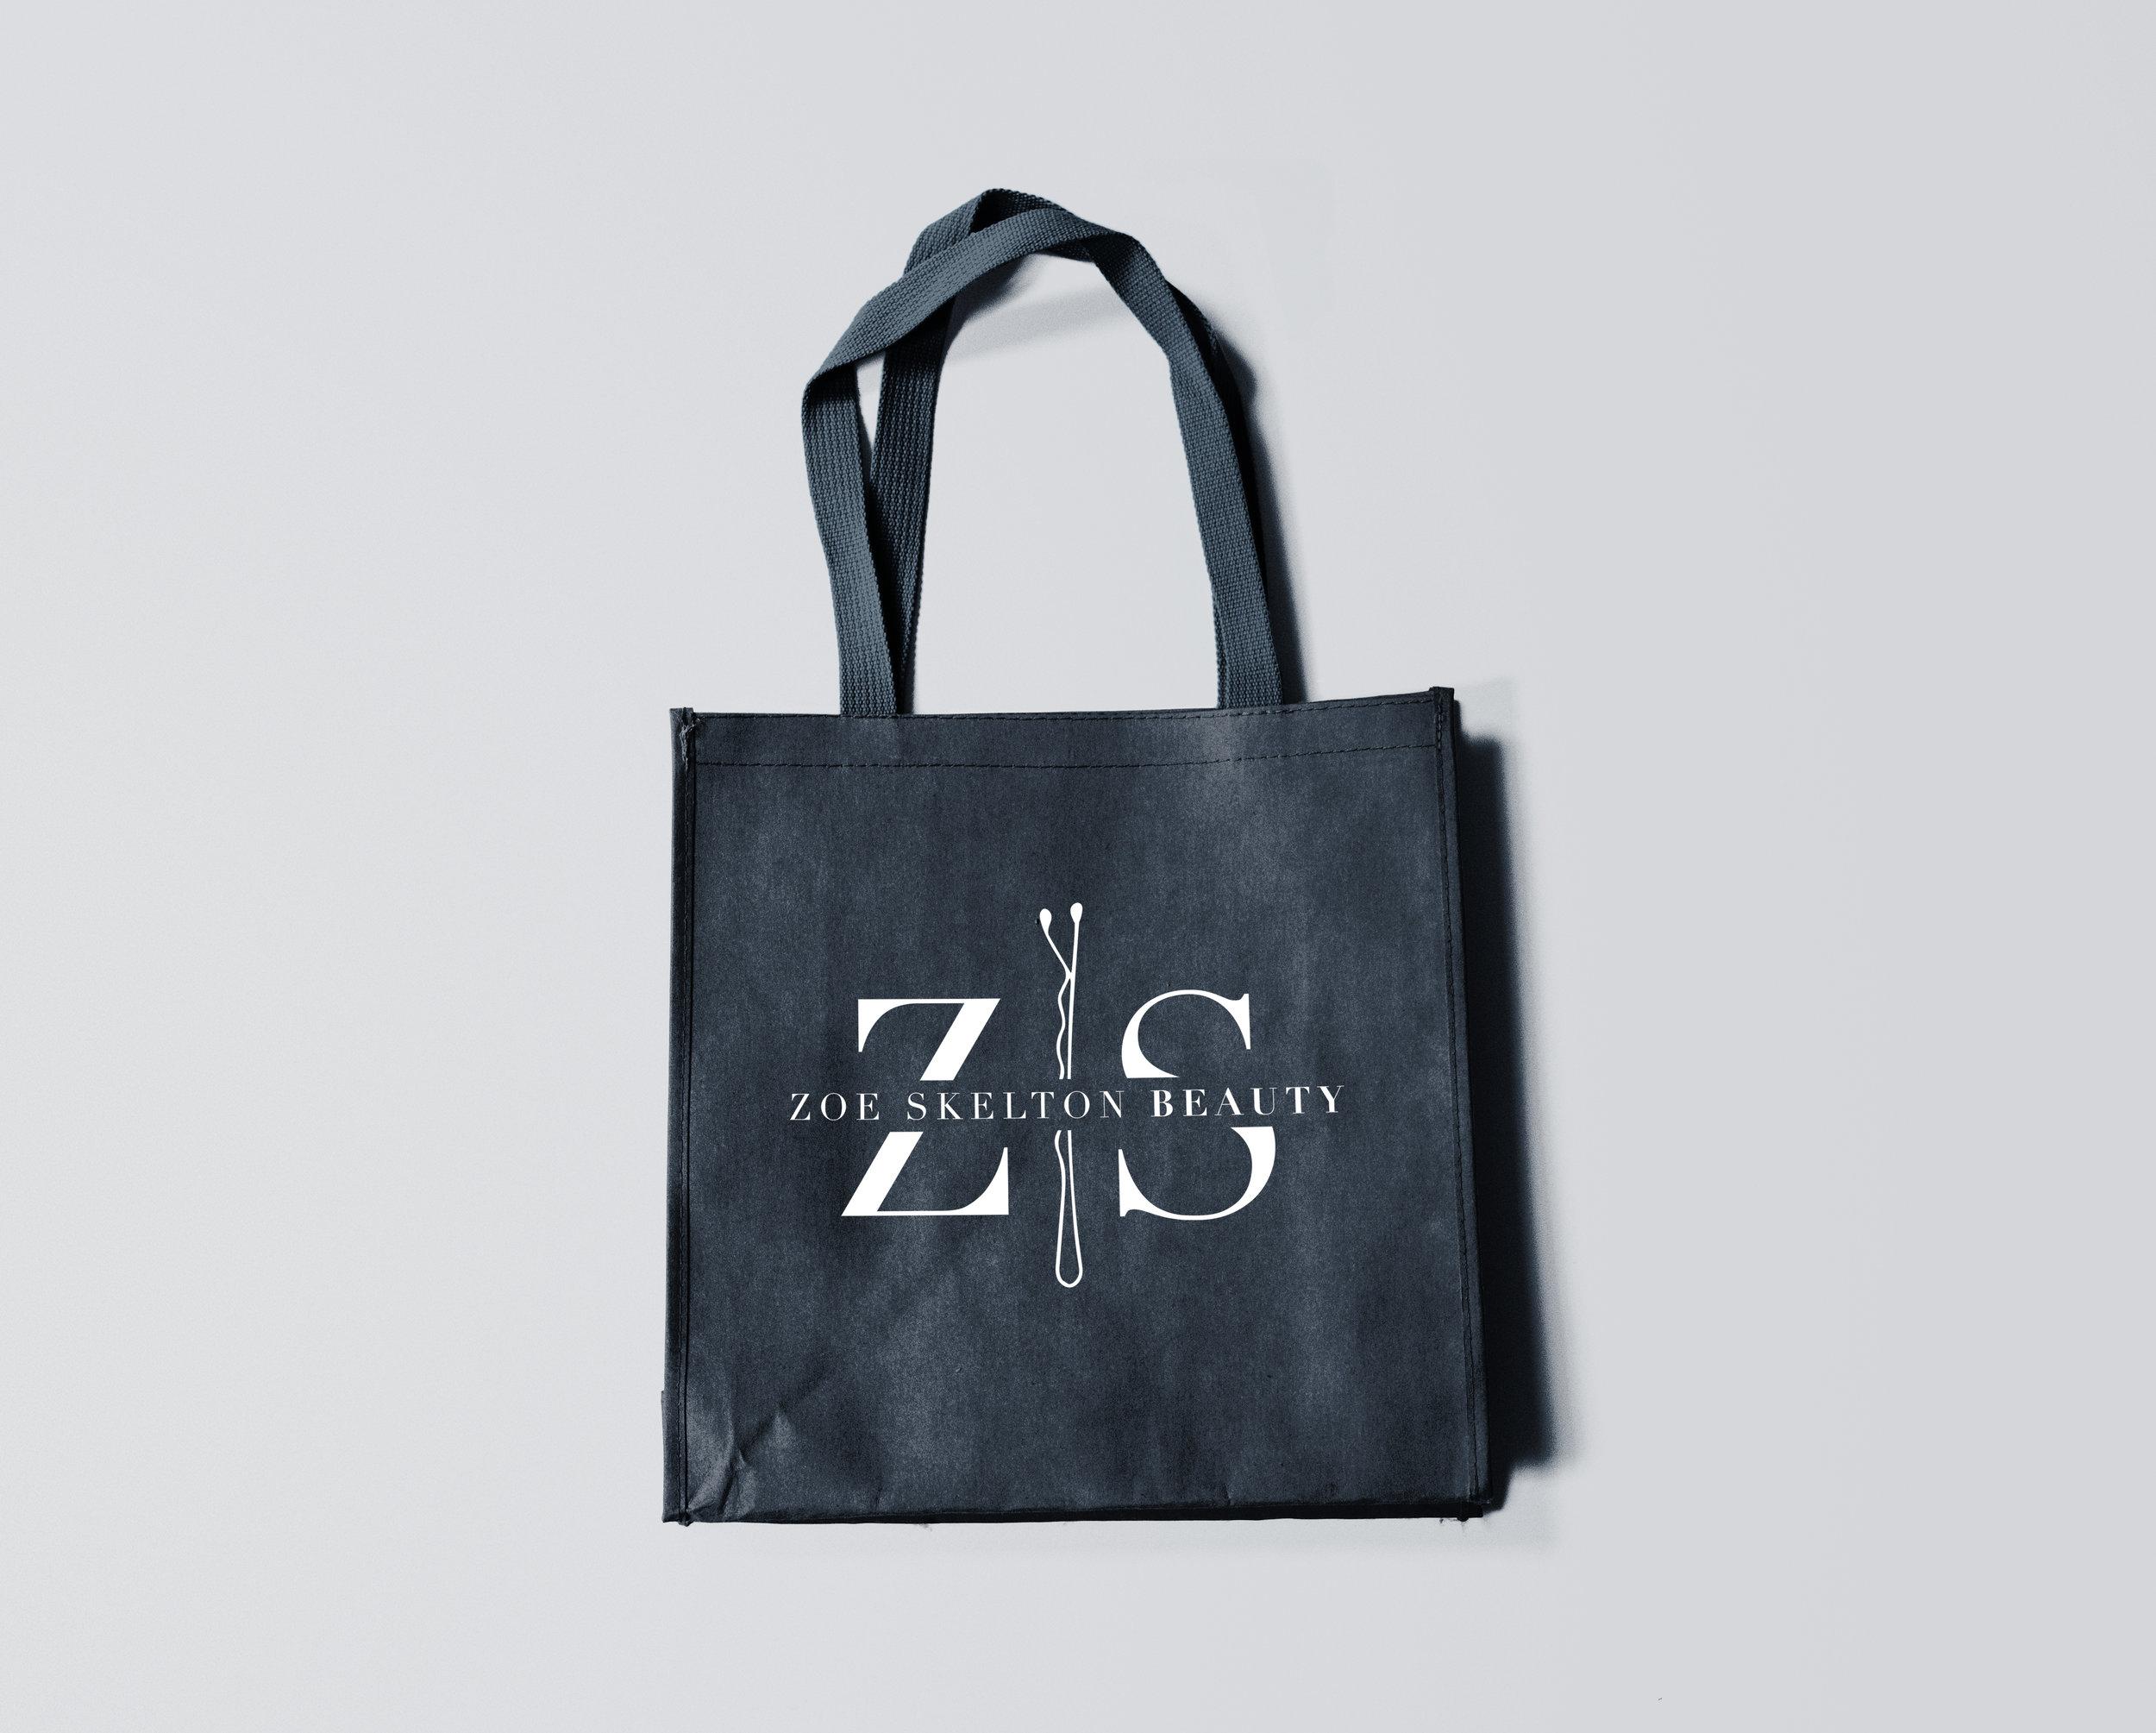 ZSB-Tote Bag Mockup.jpg